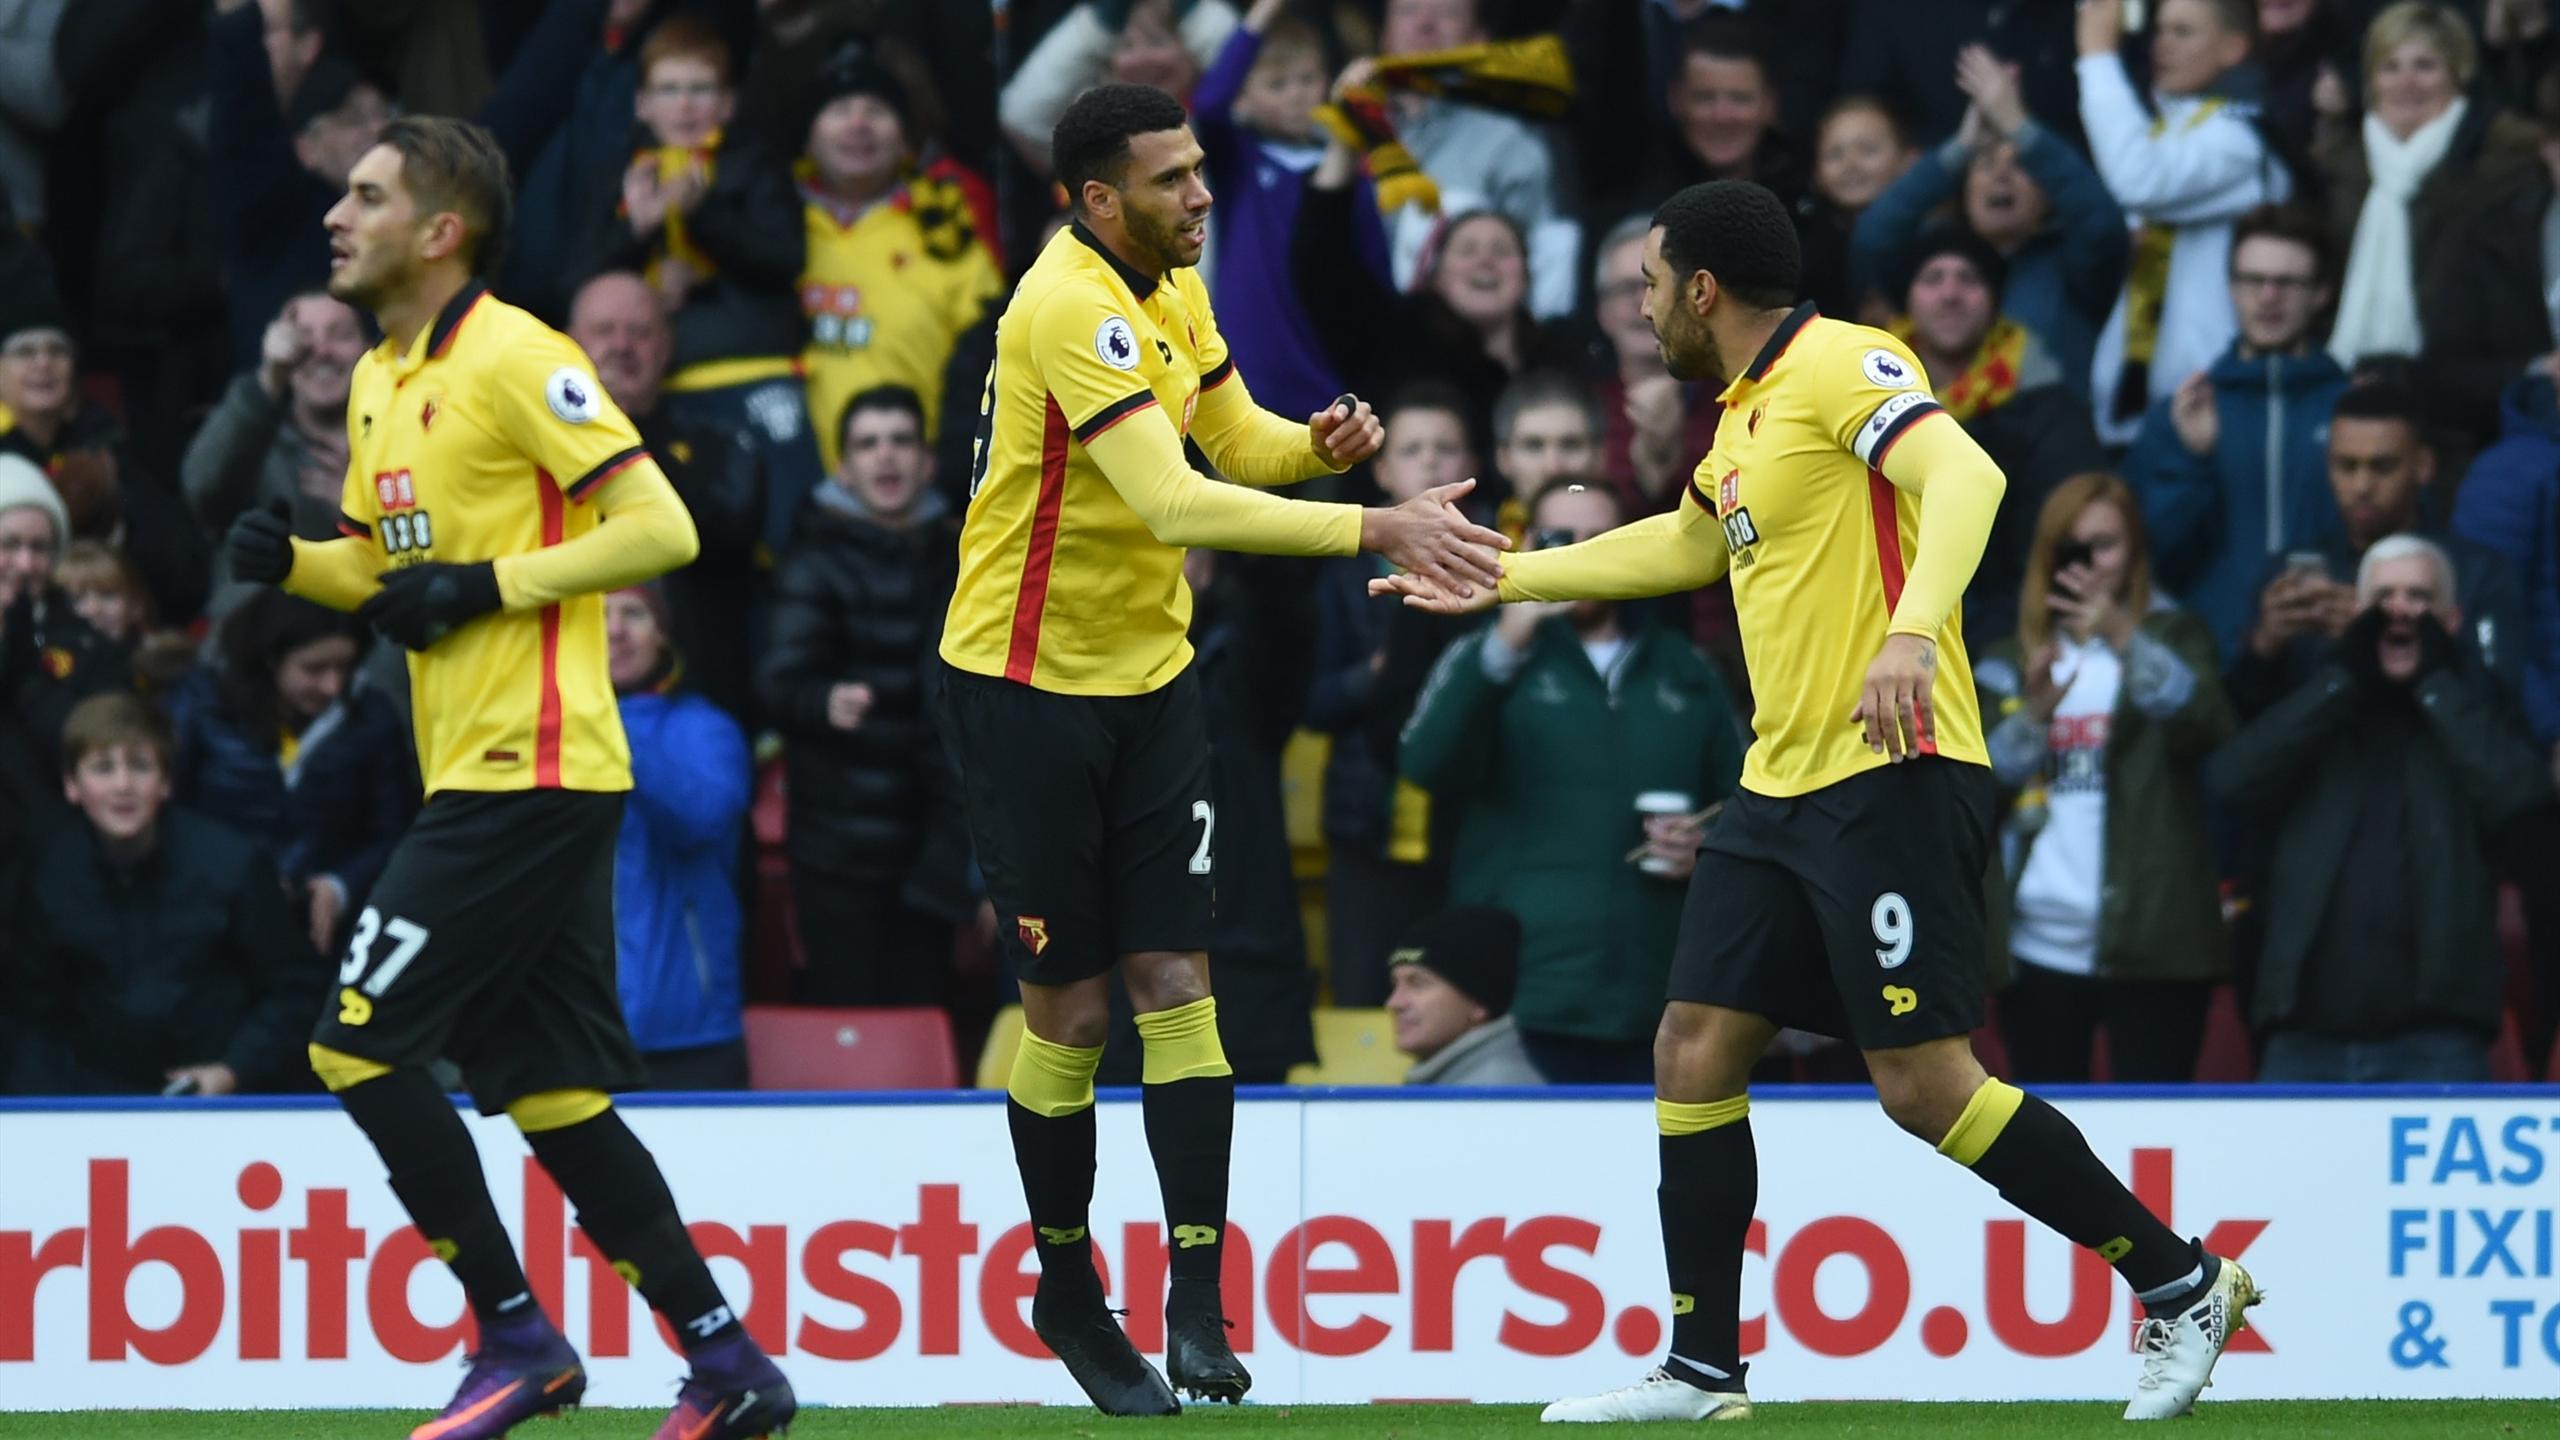 Etienne Capoue celebrates scoring their first goal